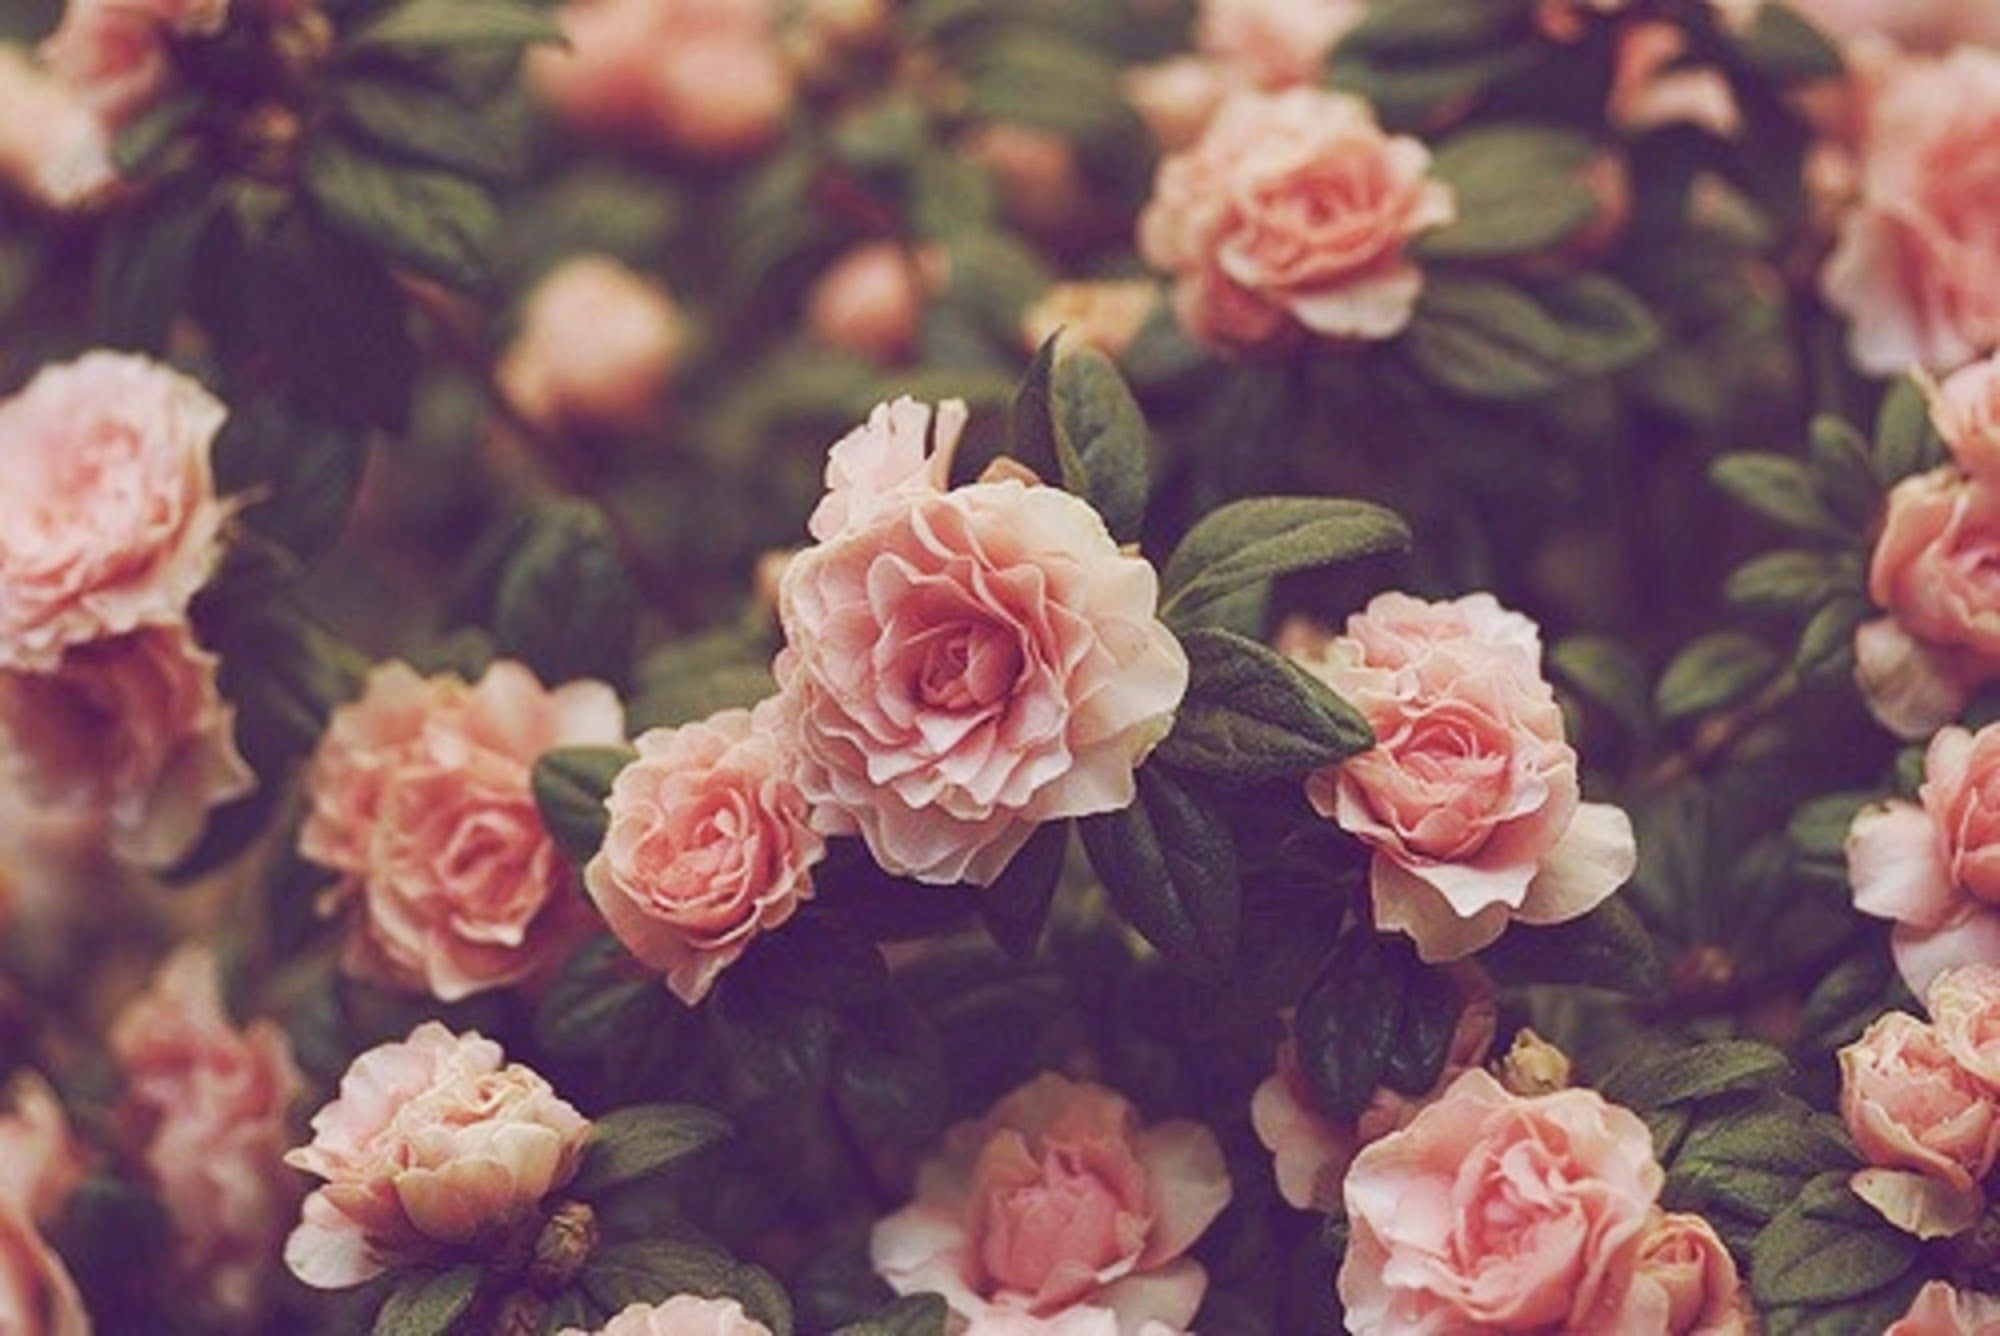 Real flower background images svg library download 10 Best ideaa: Vintage Flower Background Pinterestissä ... svg library download